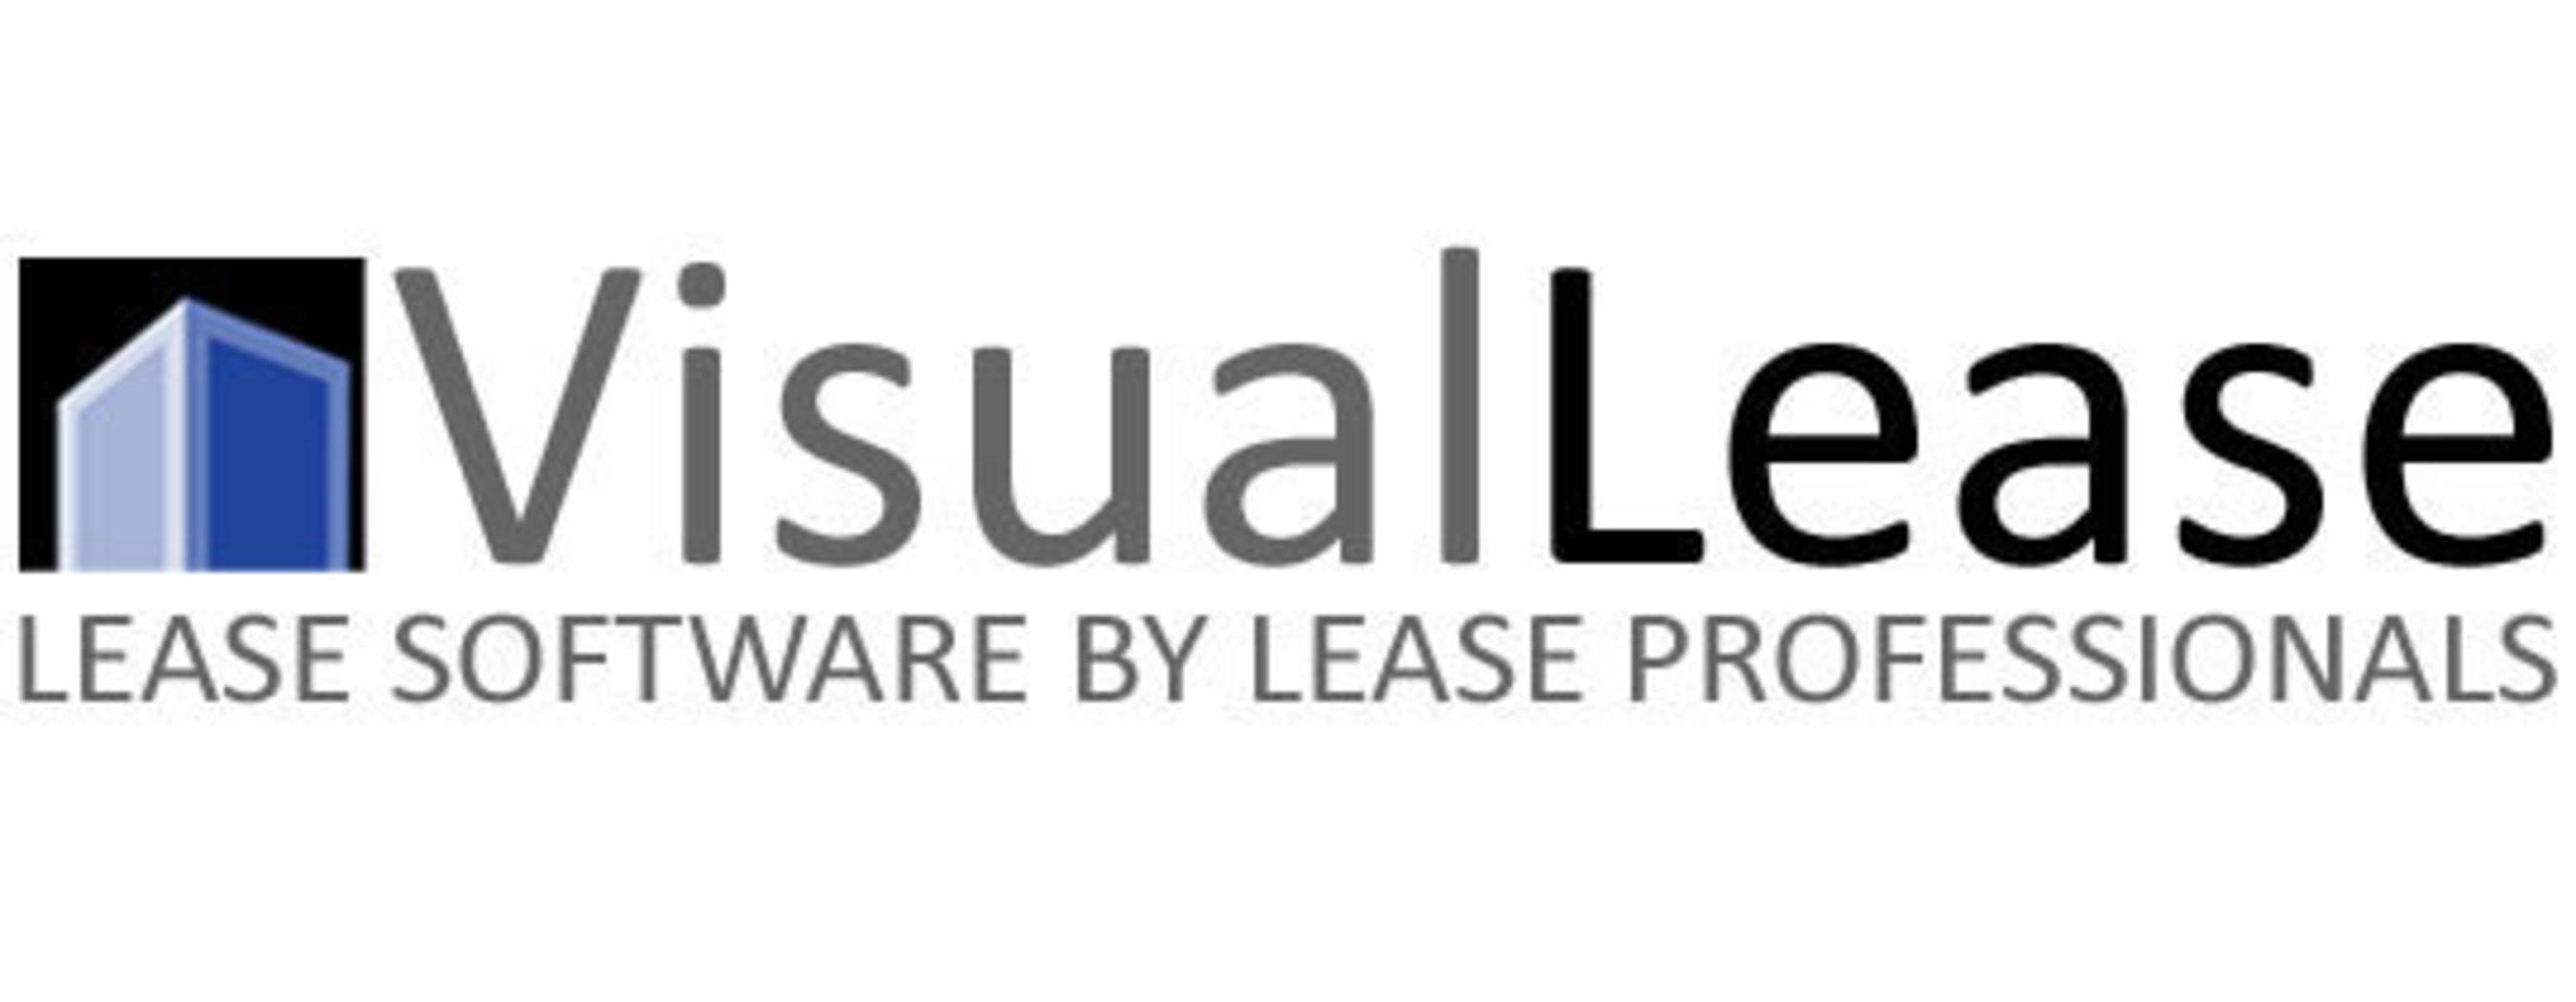 Michael Bell joins Visual Lease as a Senior Advisor